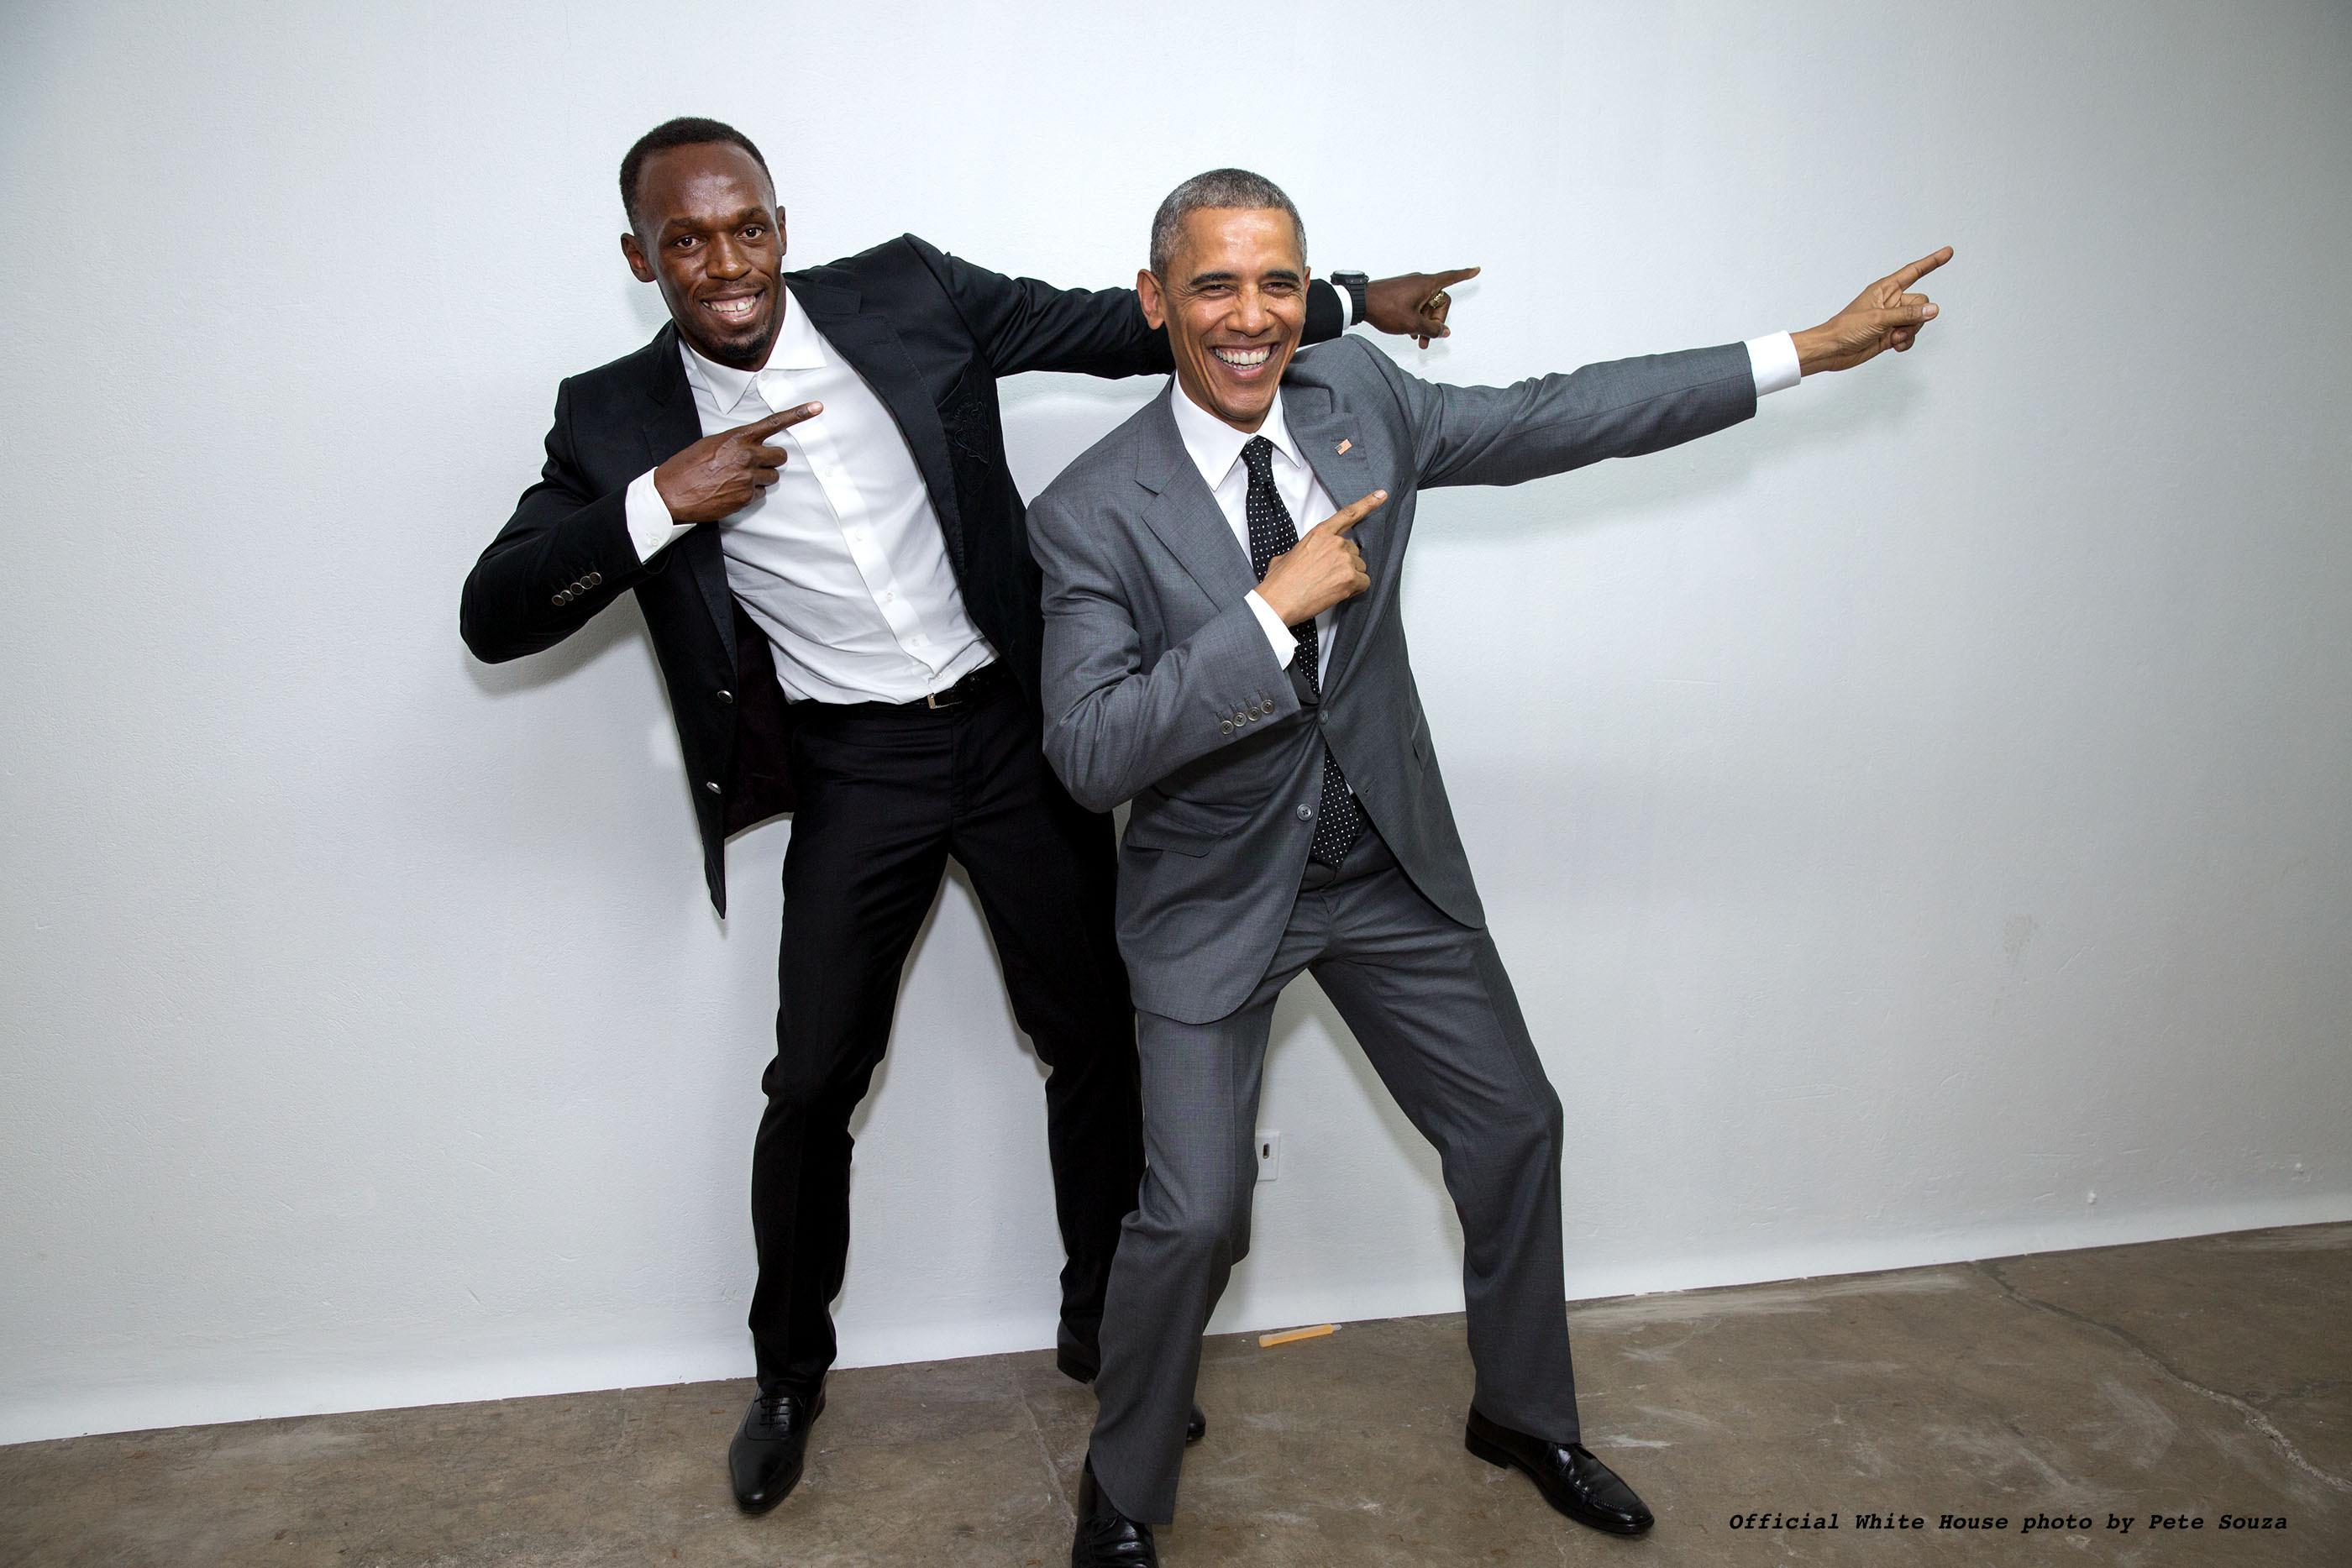 POTUS strikes a pose with Usain Bolt. April, 2015.